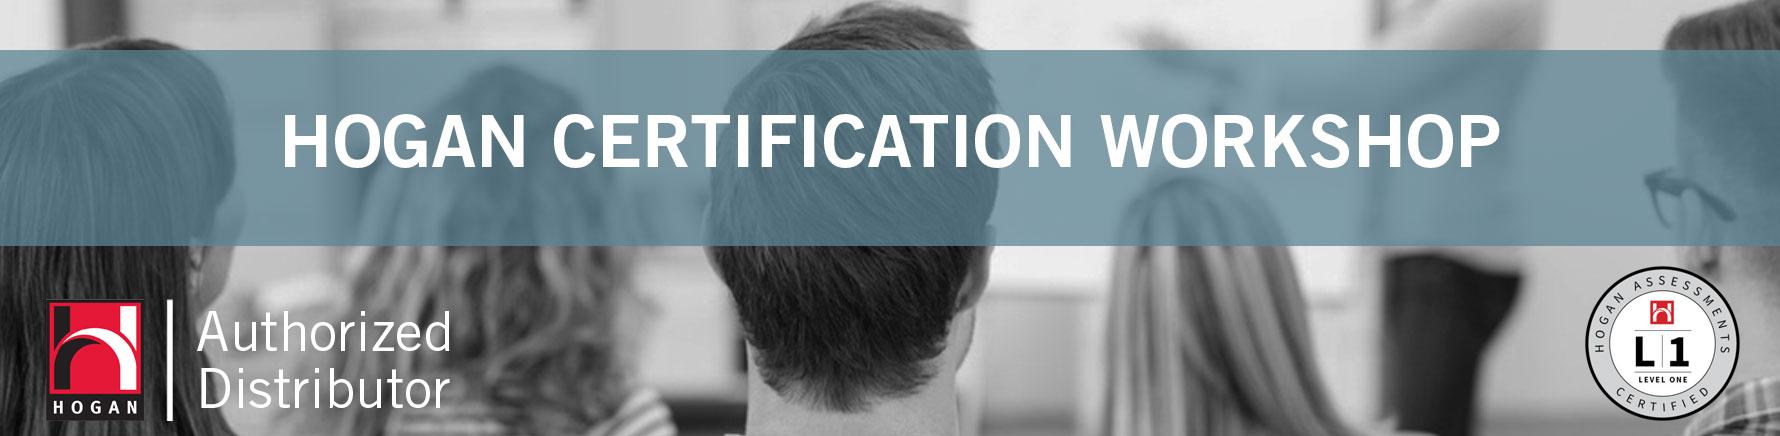 landing-certification-workshop.jpg